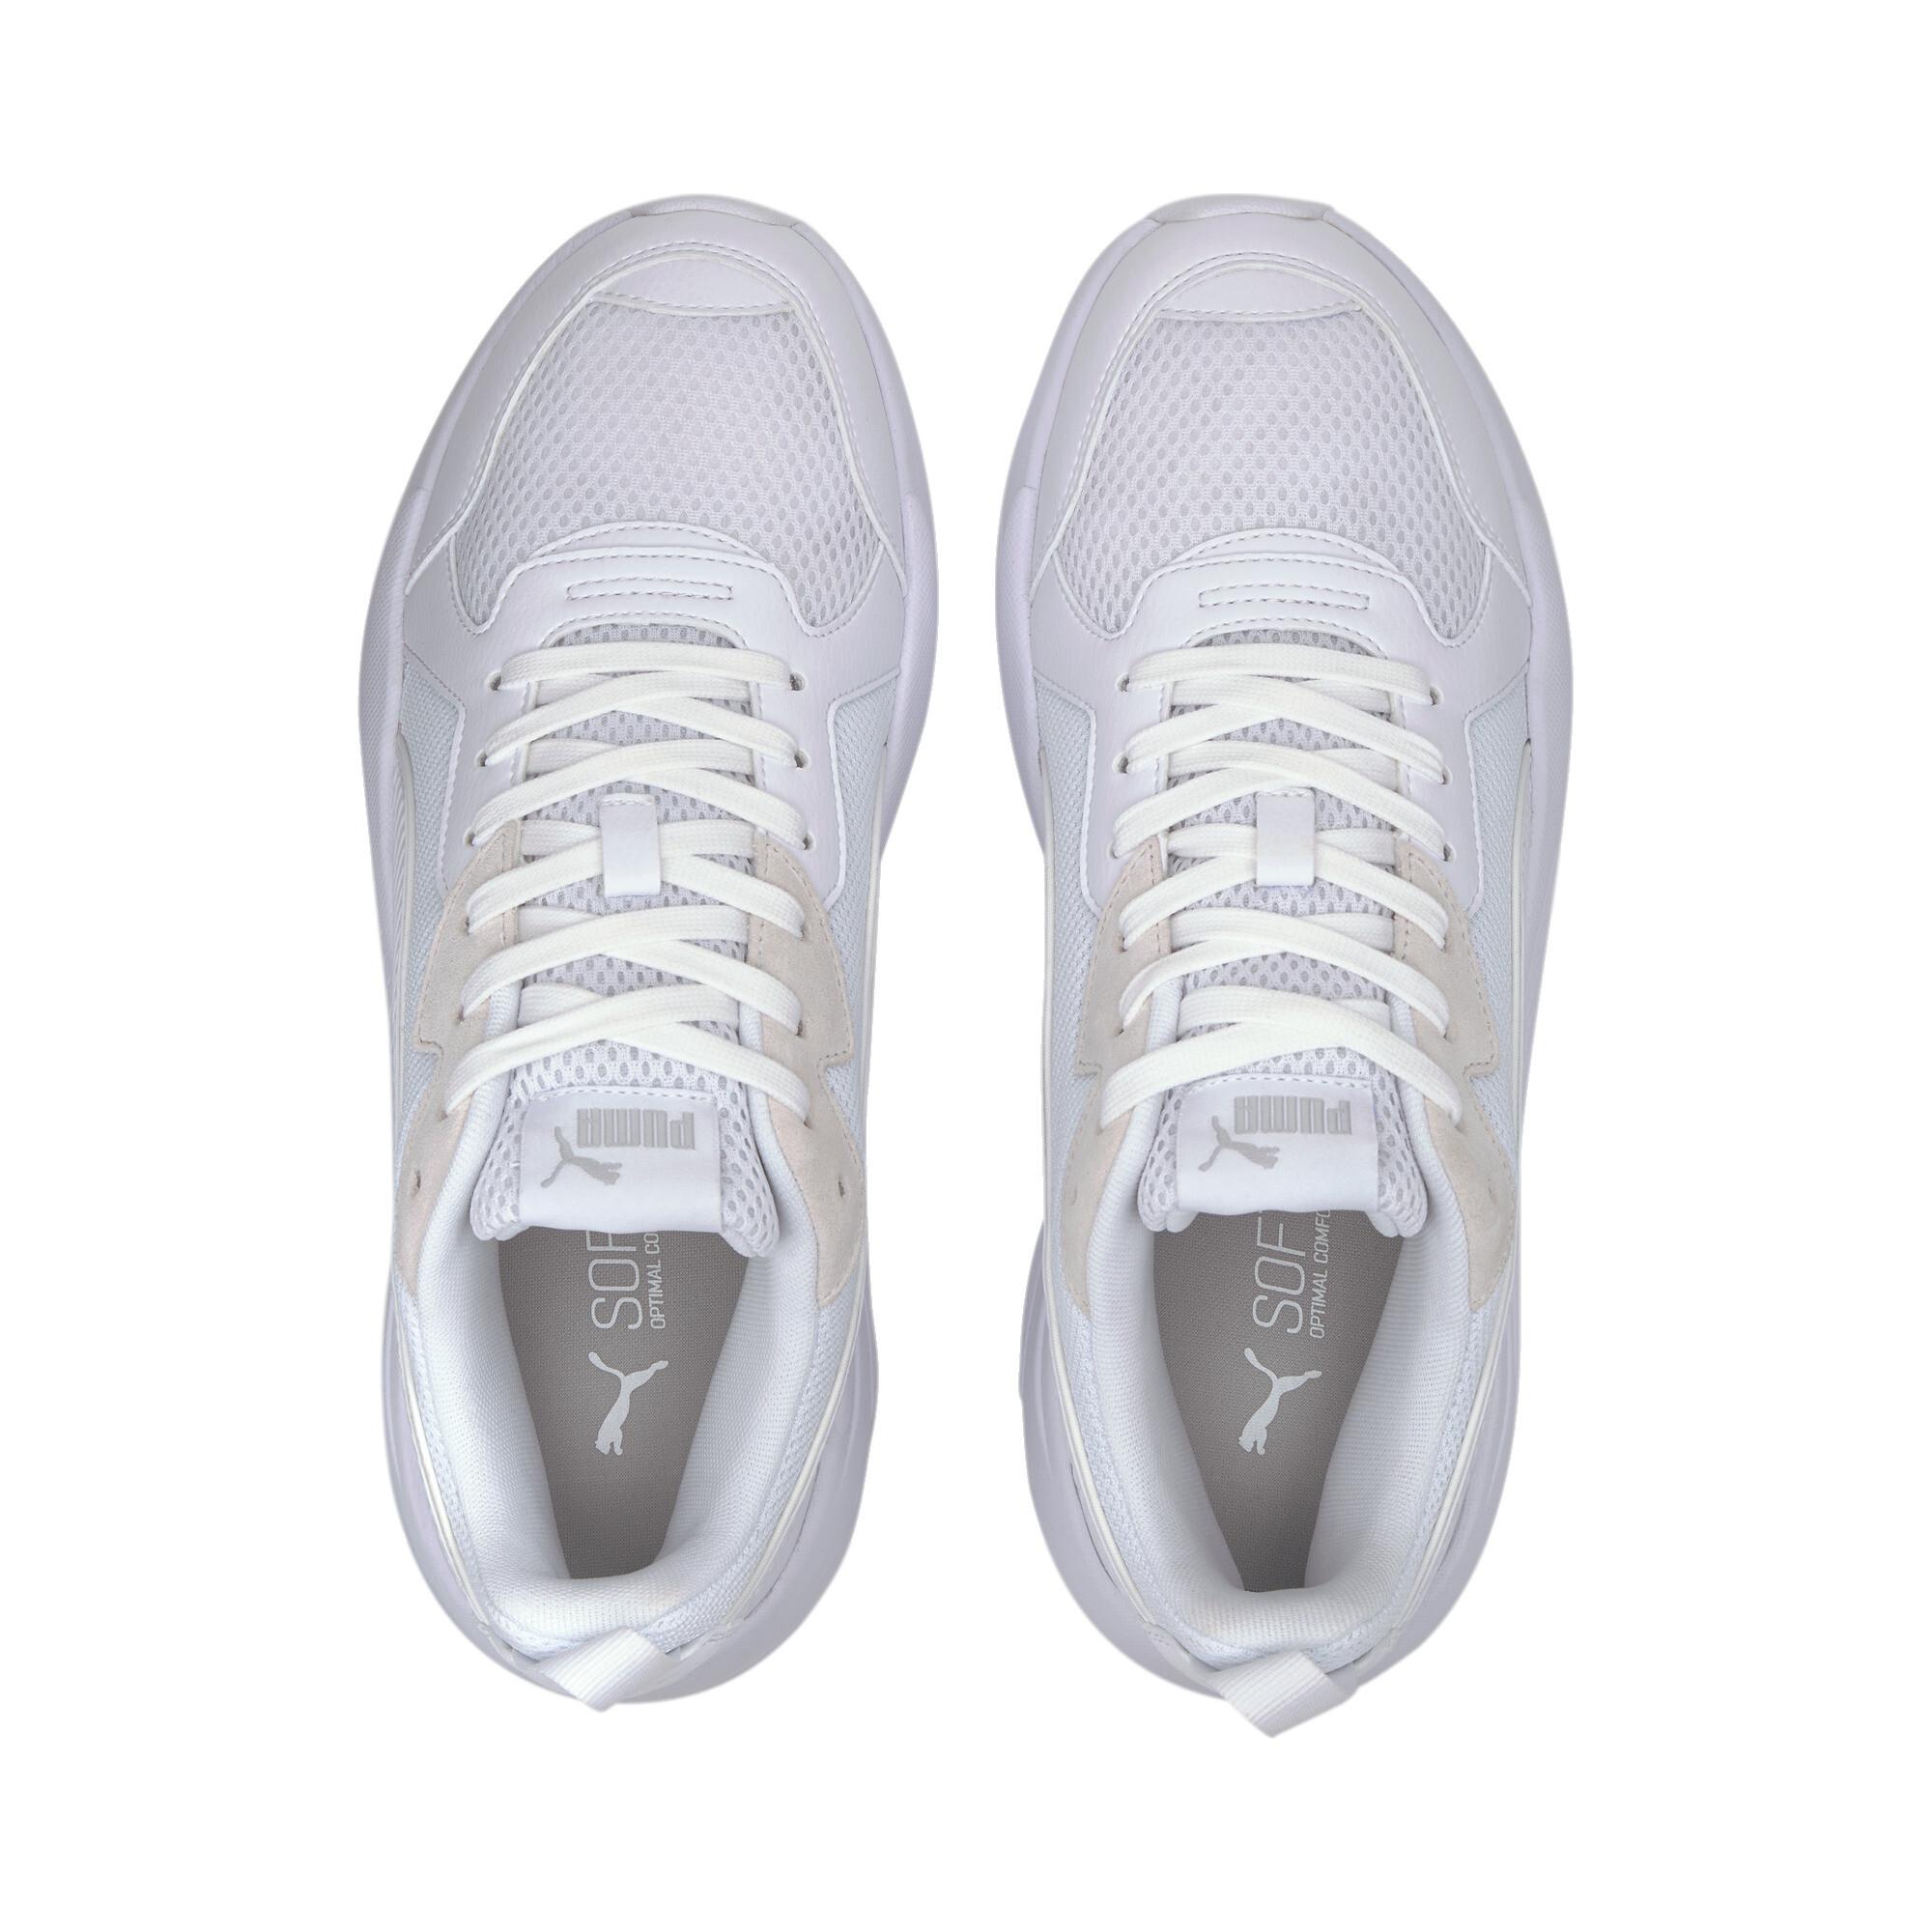 PUMA-Men-039-s-X-RAY-Sneakers thumbnail 29